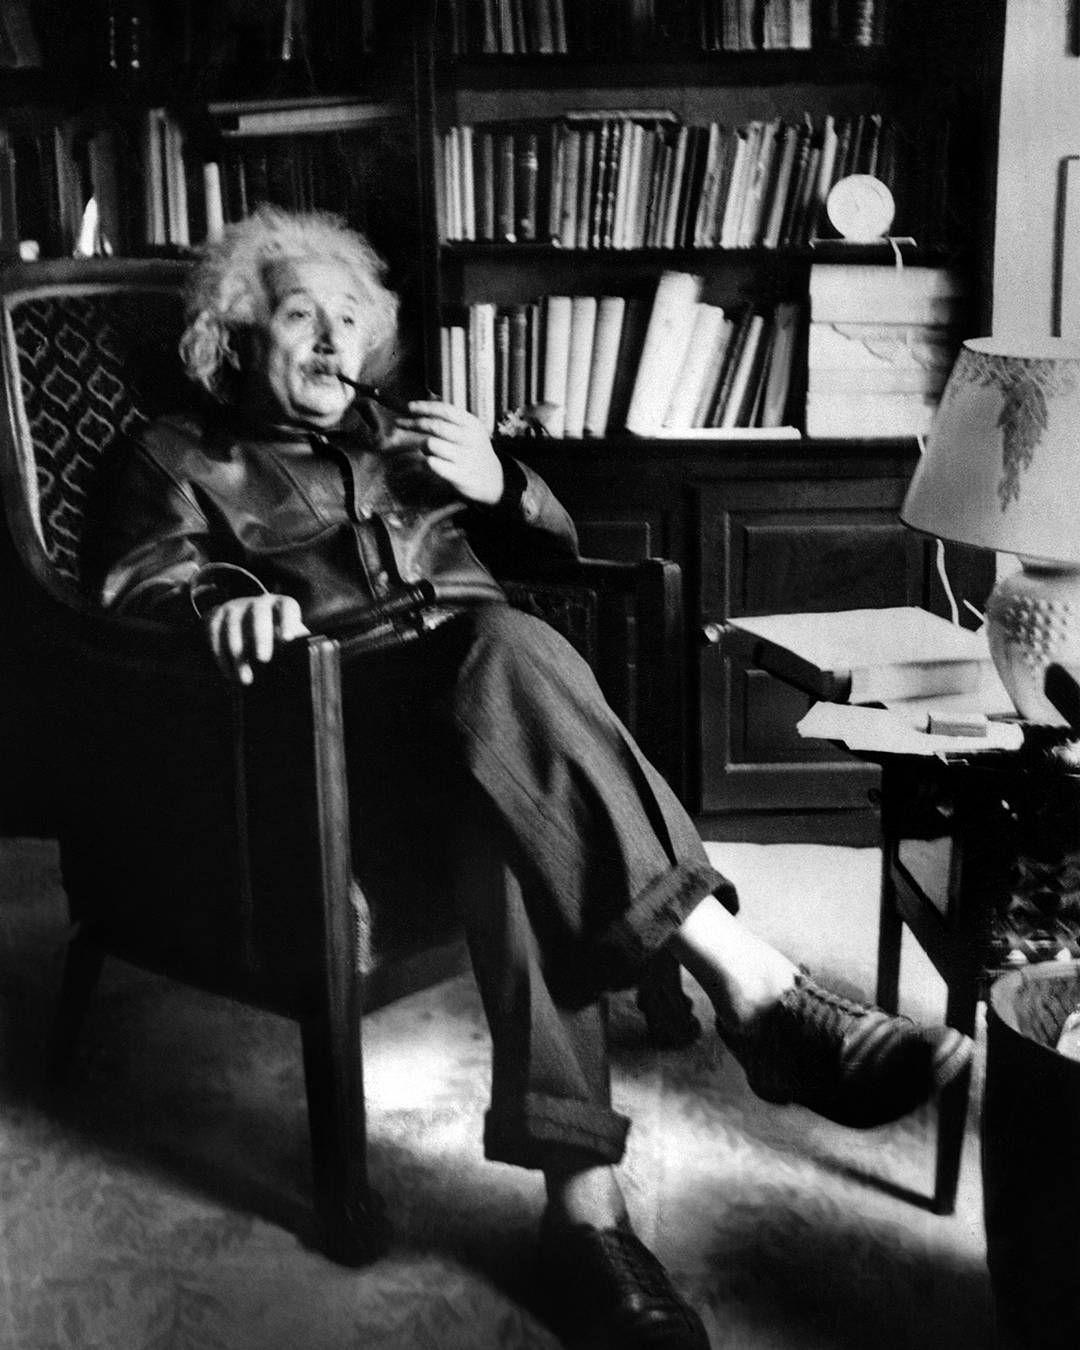 Albert Einstein was the proud owner of a fantastically